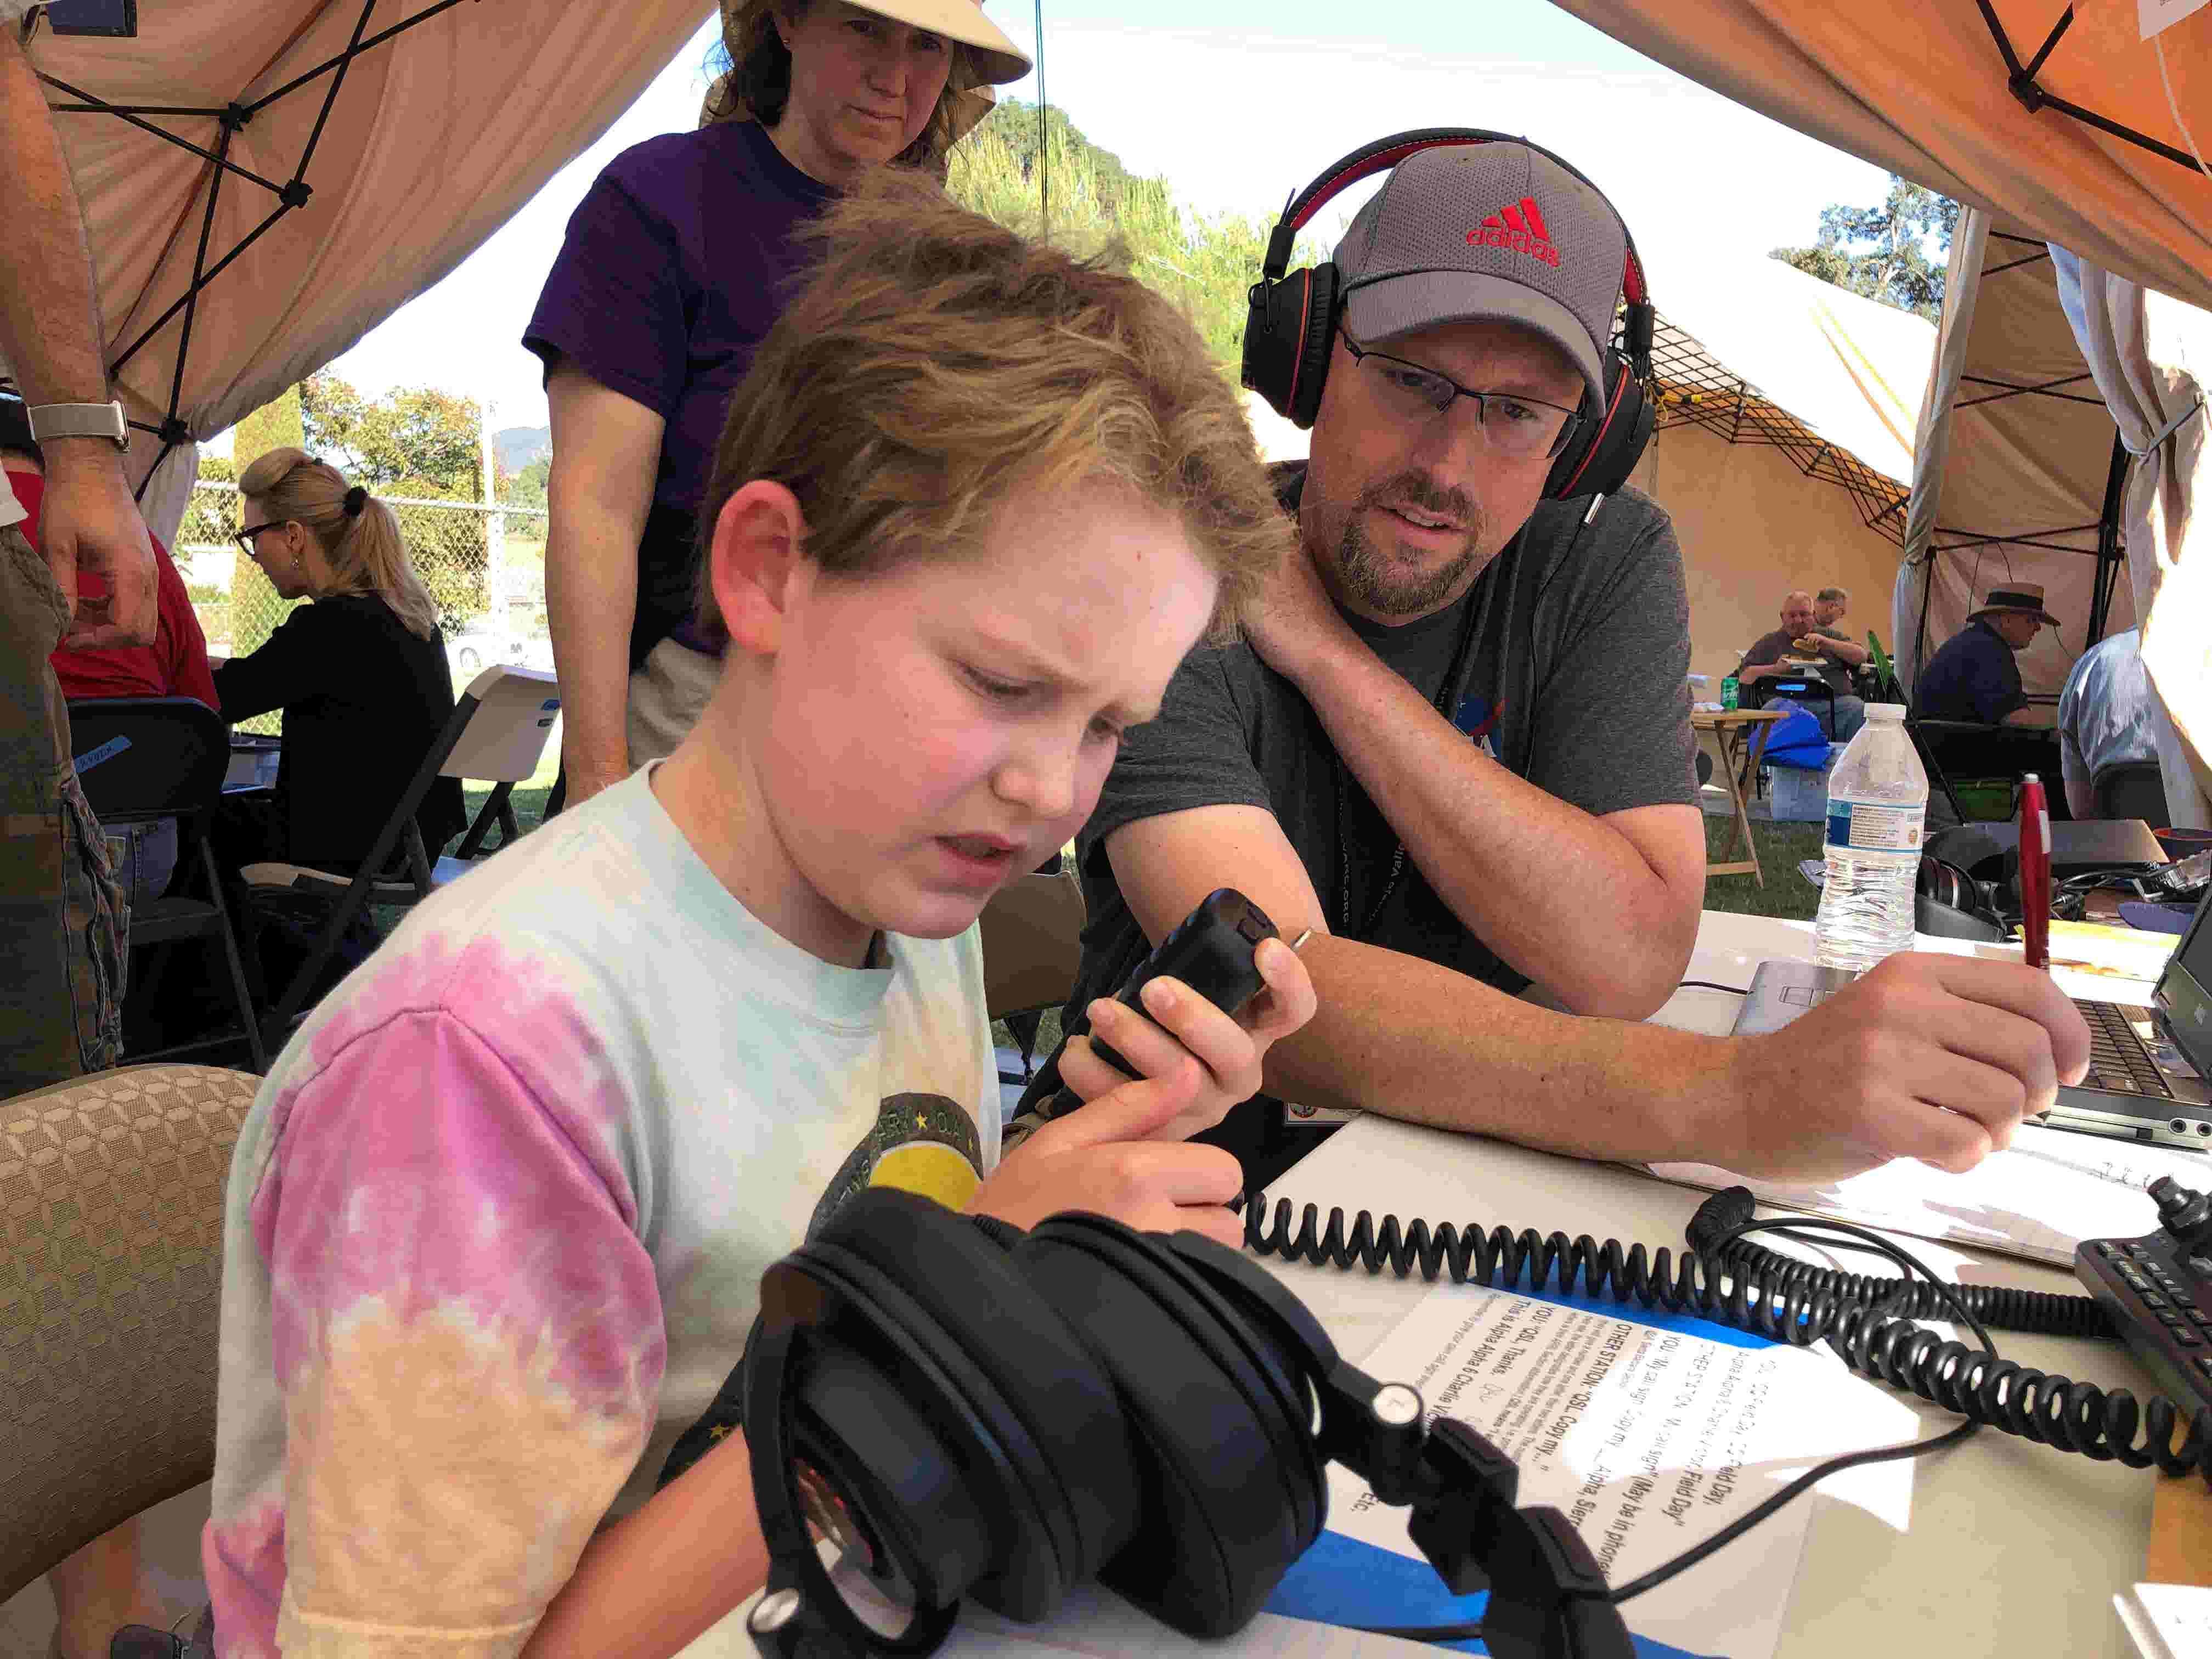 Field Day Archives - KB6NU's Ham Radio Blog